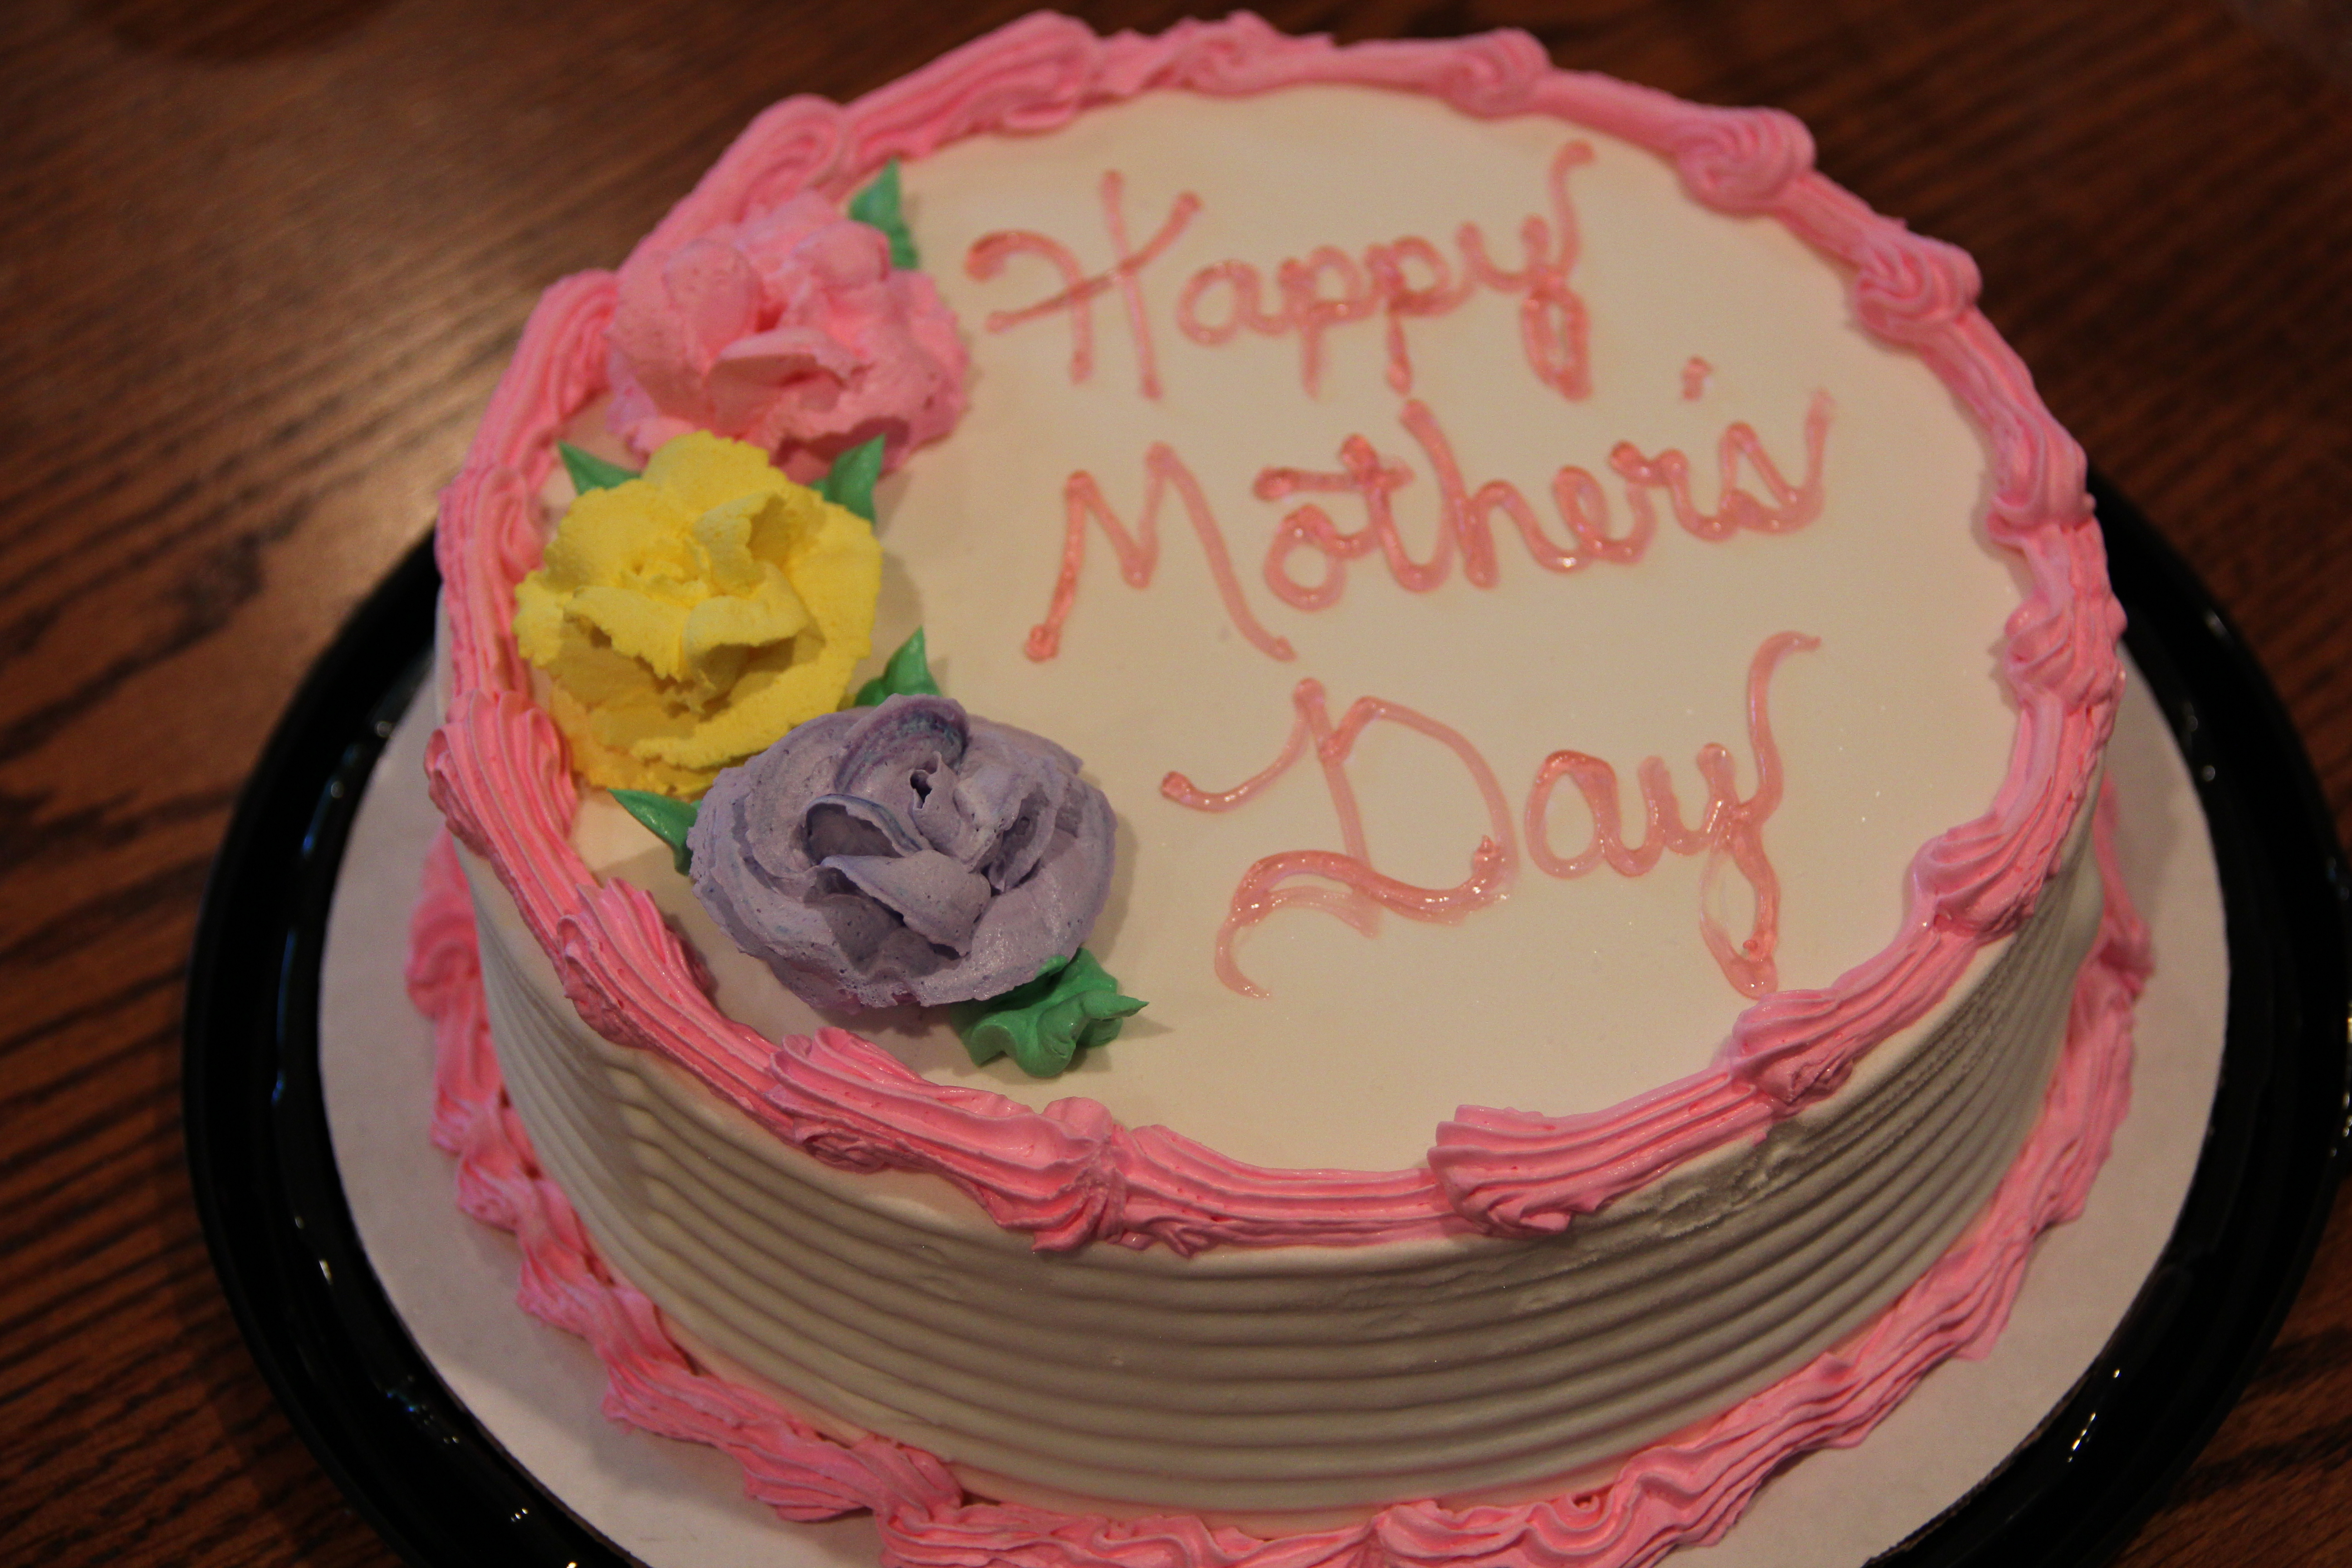 Happy Mothers Day Cakes Pics